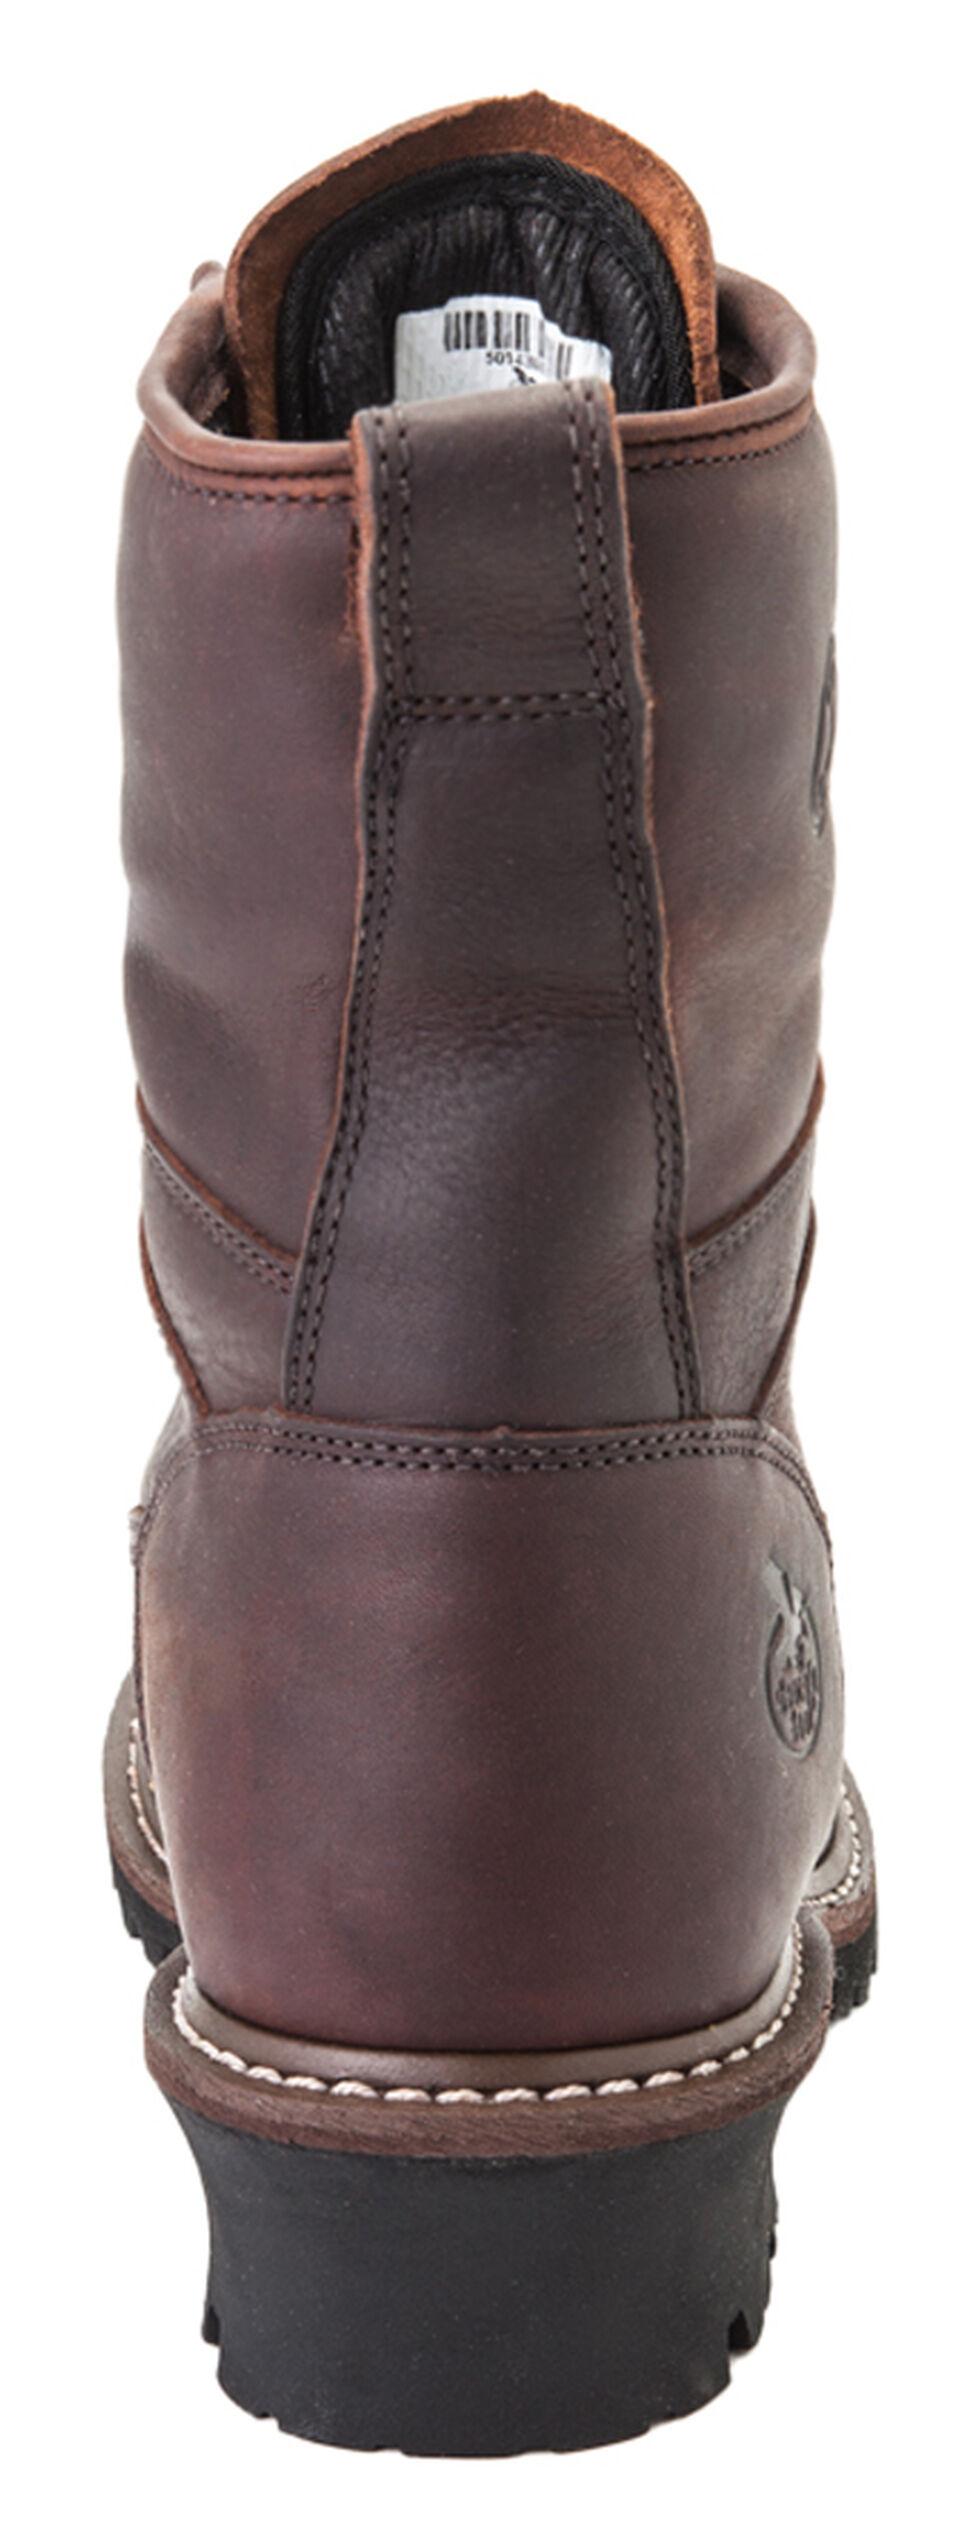 Georgia Waterproof Logger Boots - Steel Toe, Chocolate, hi-res